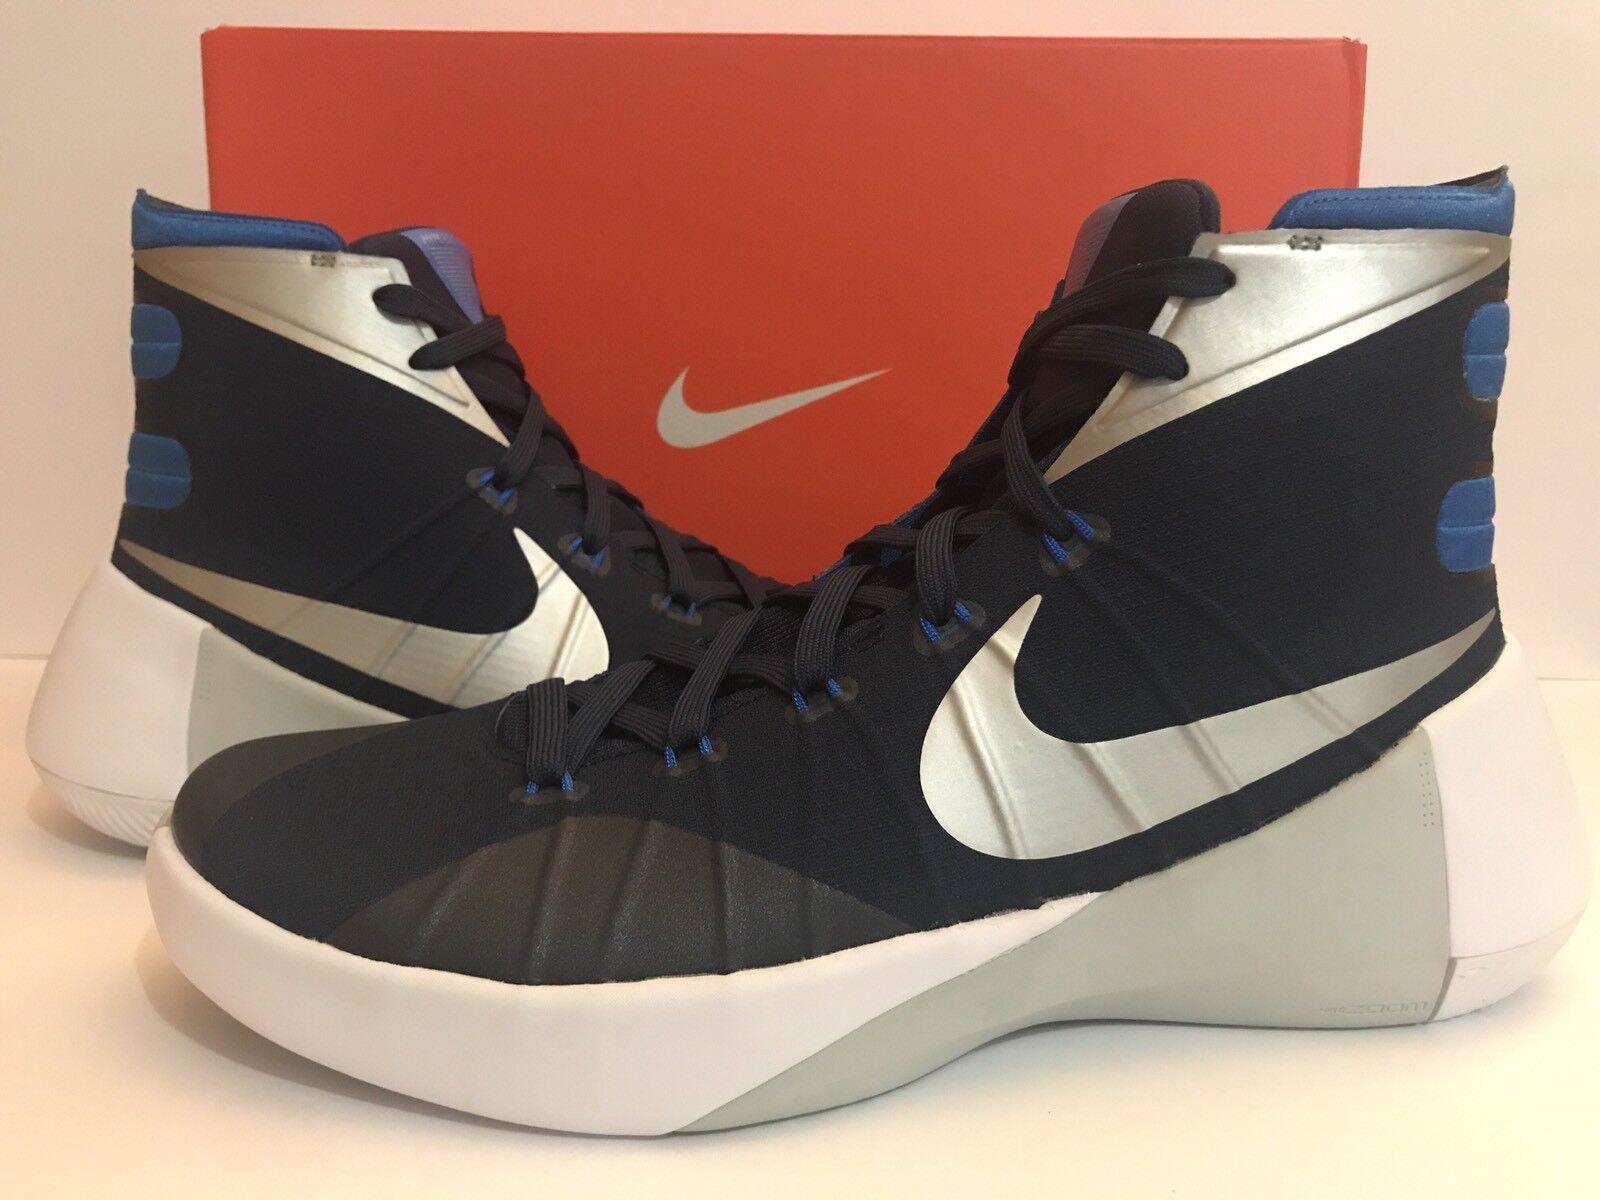 Nike hyperdunk 2015 11,5 749645-405 mignightnavyBlauWeiß sz 11,5 2015 624c26